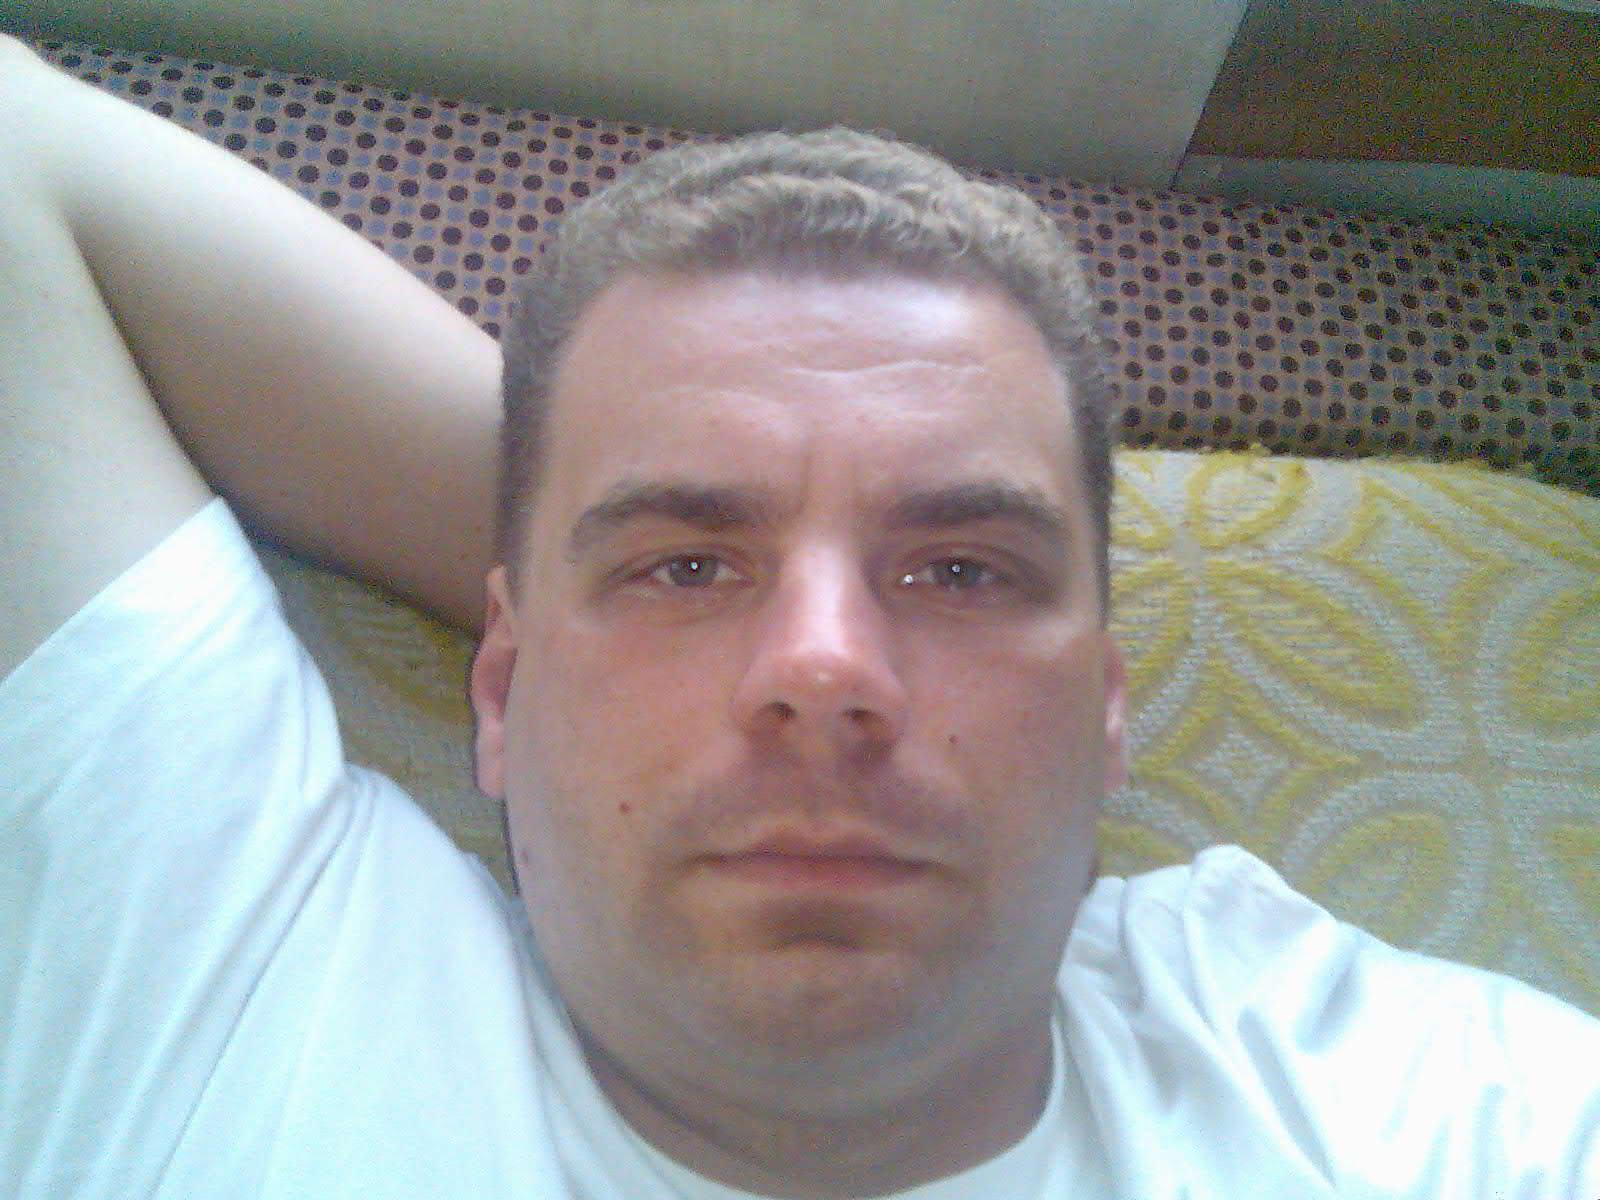 Swenyke, 38